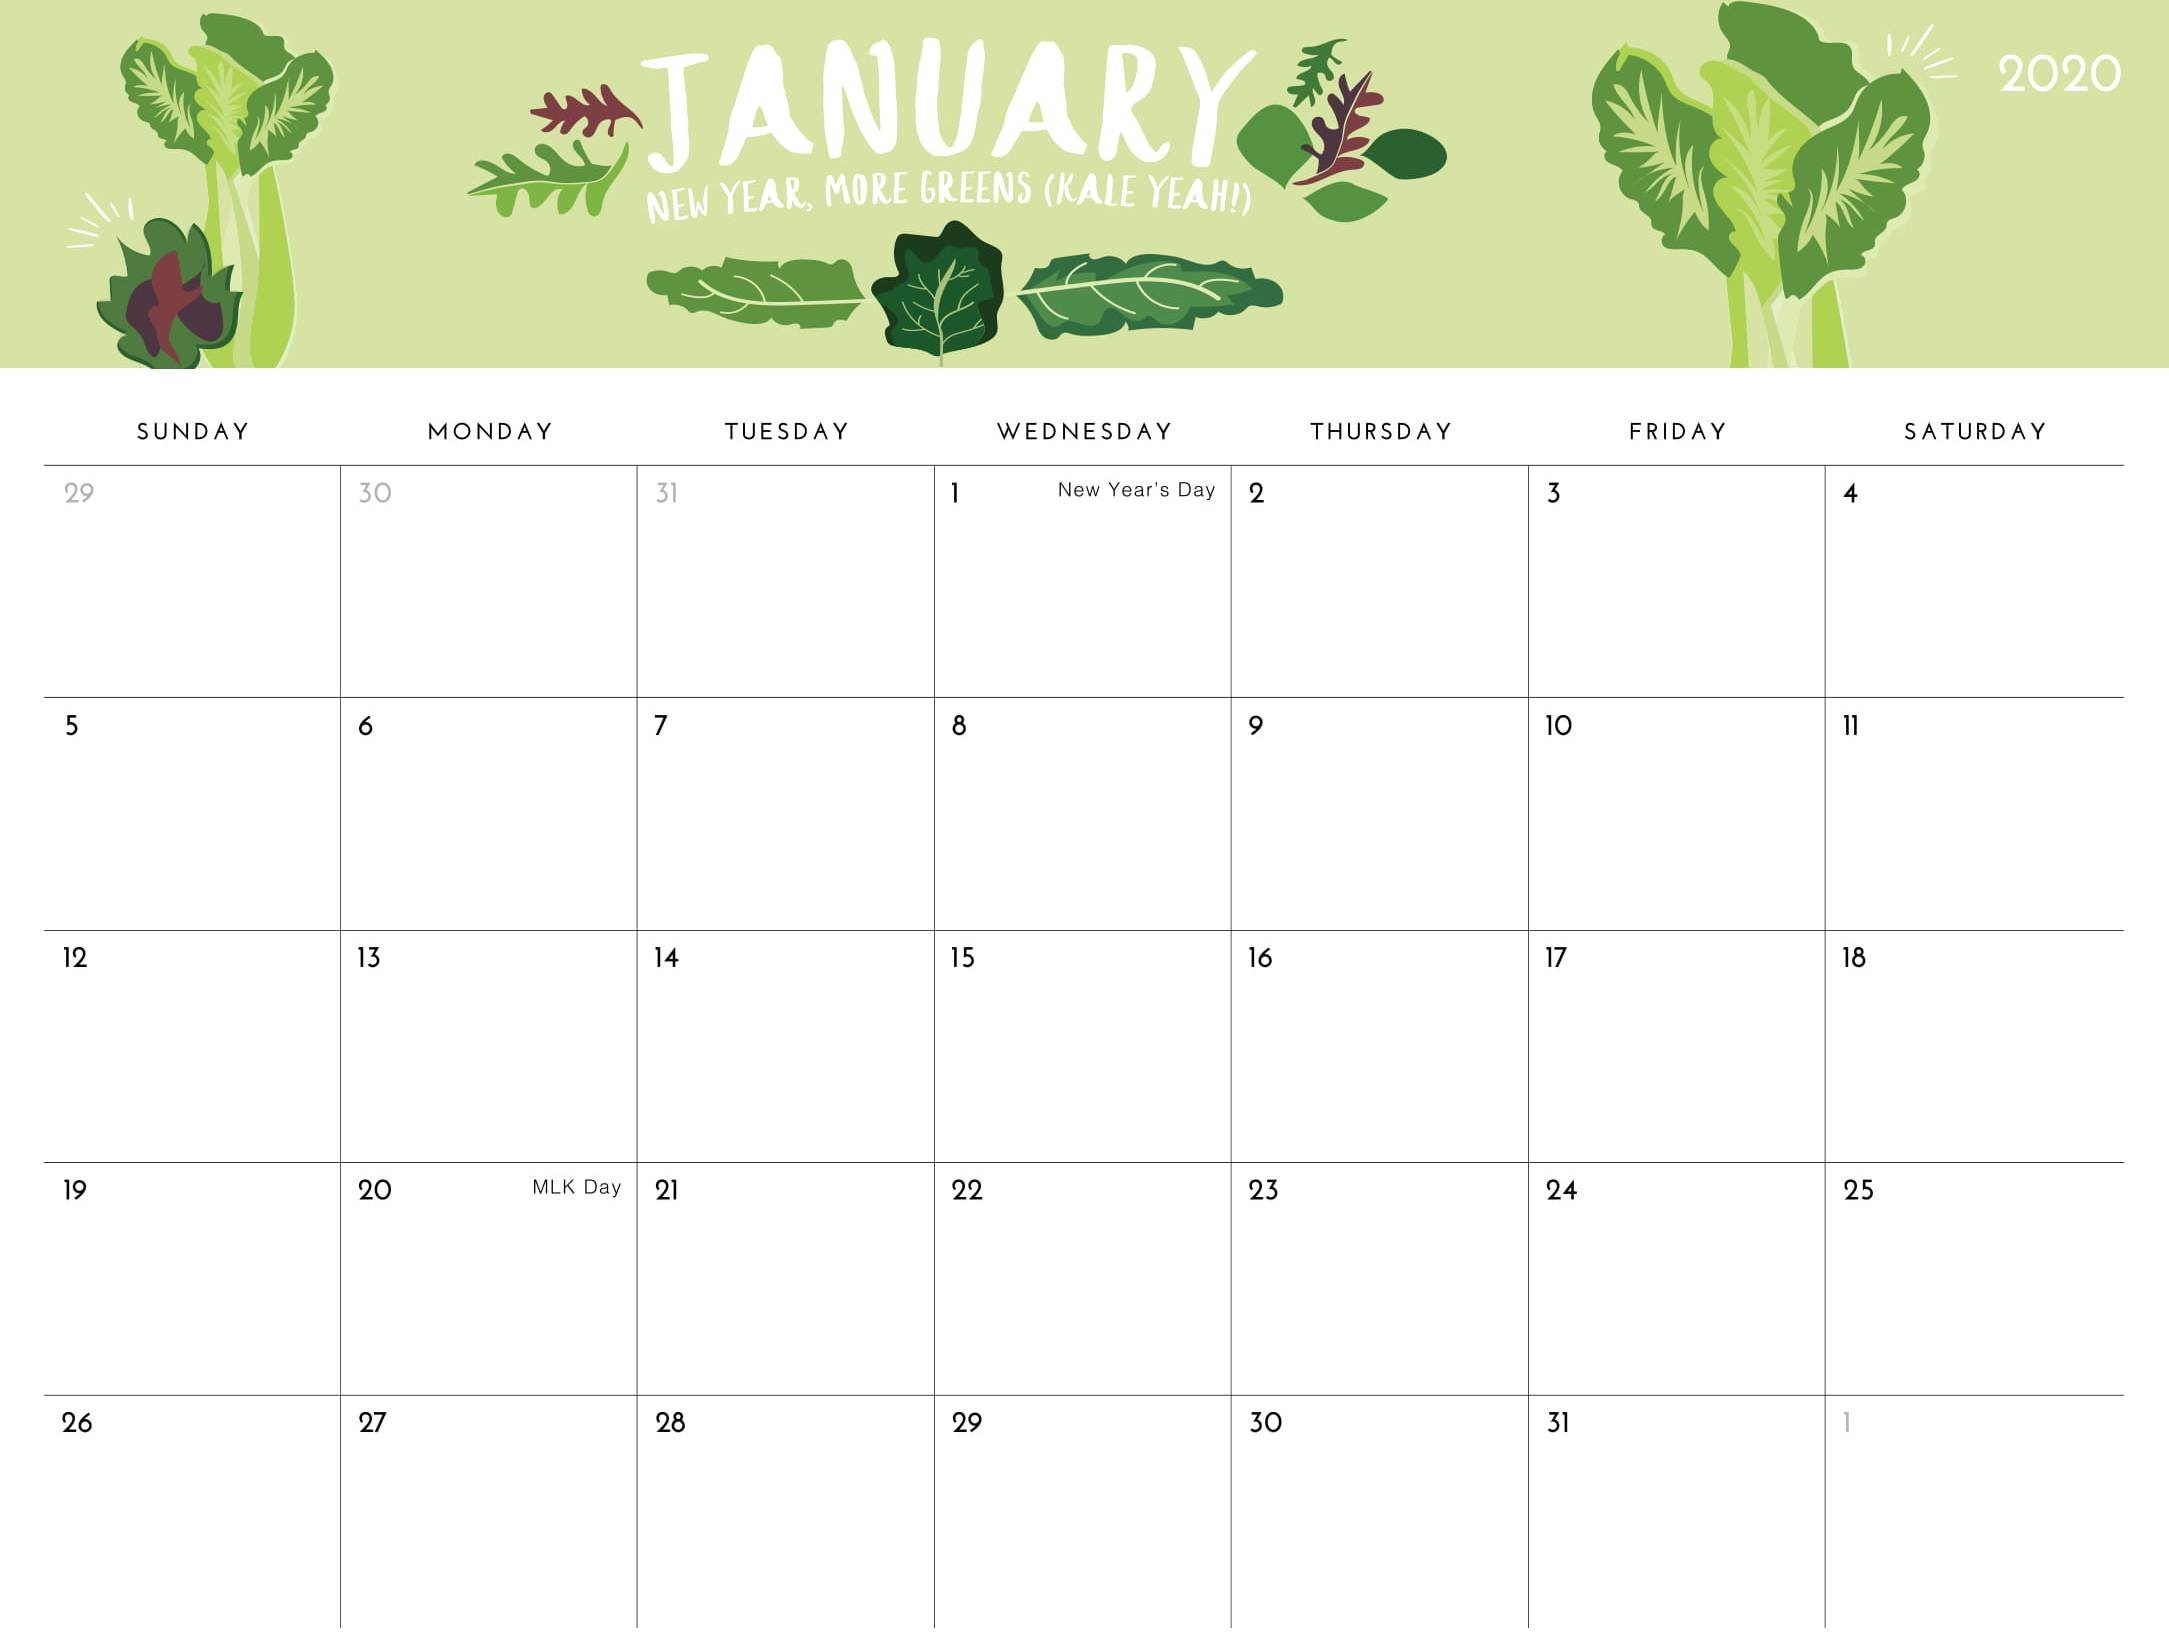 Printable January 2020 Calendar Uk With National Holidays